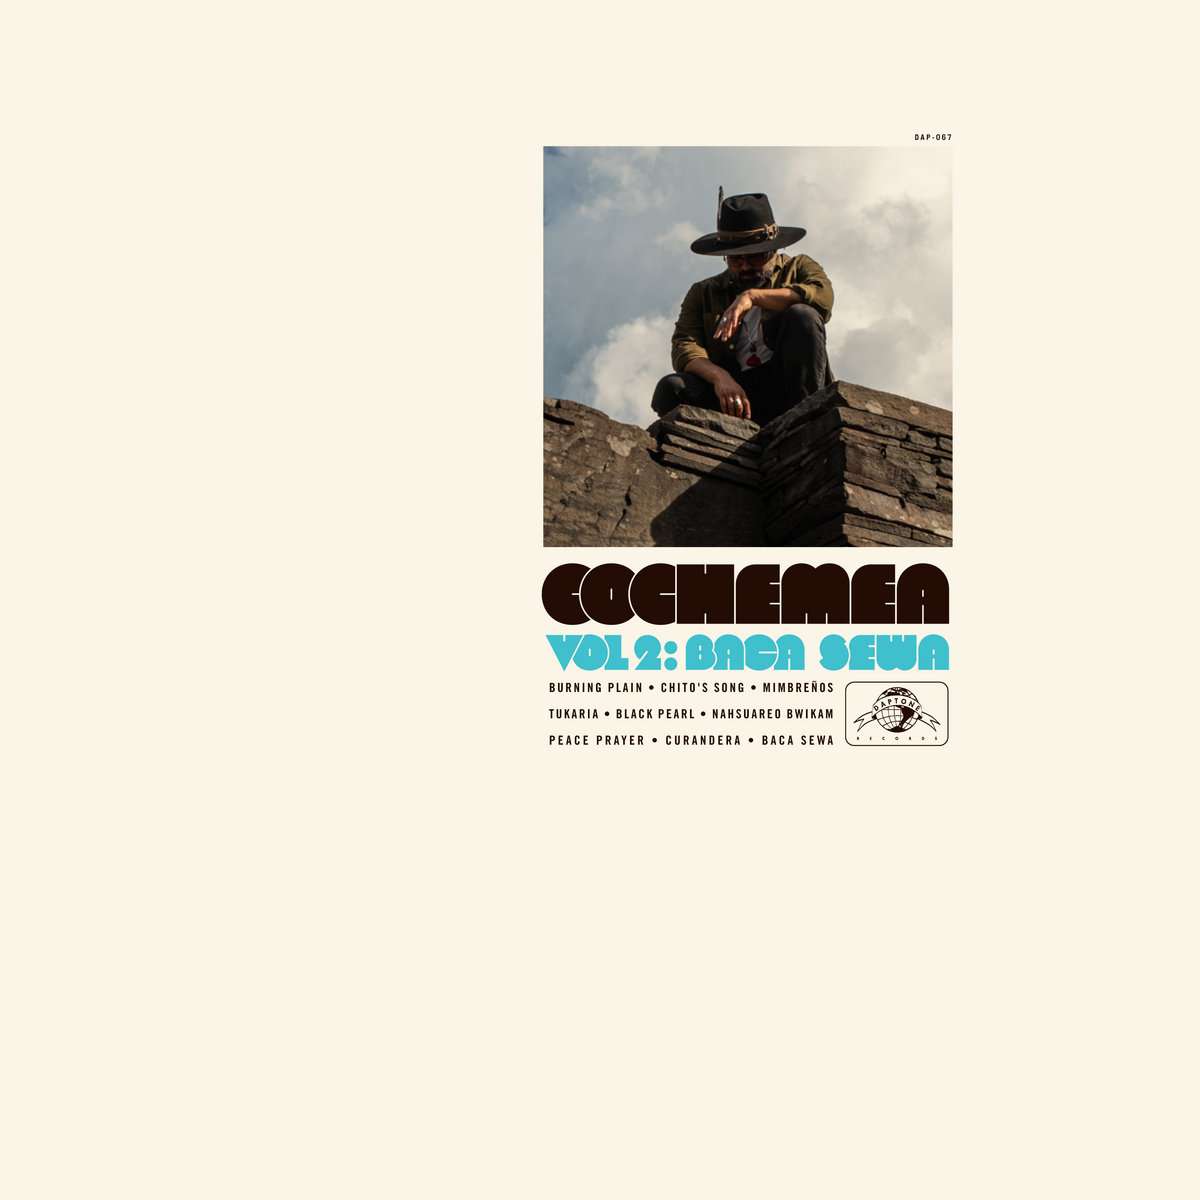 Vol 2 | Baca Sewa (ltd Amethyst Vinyl)